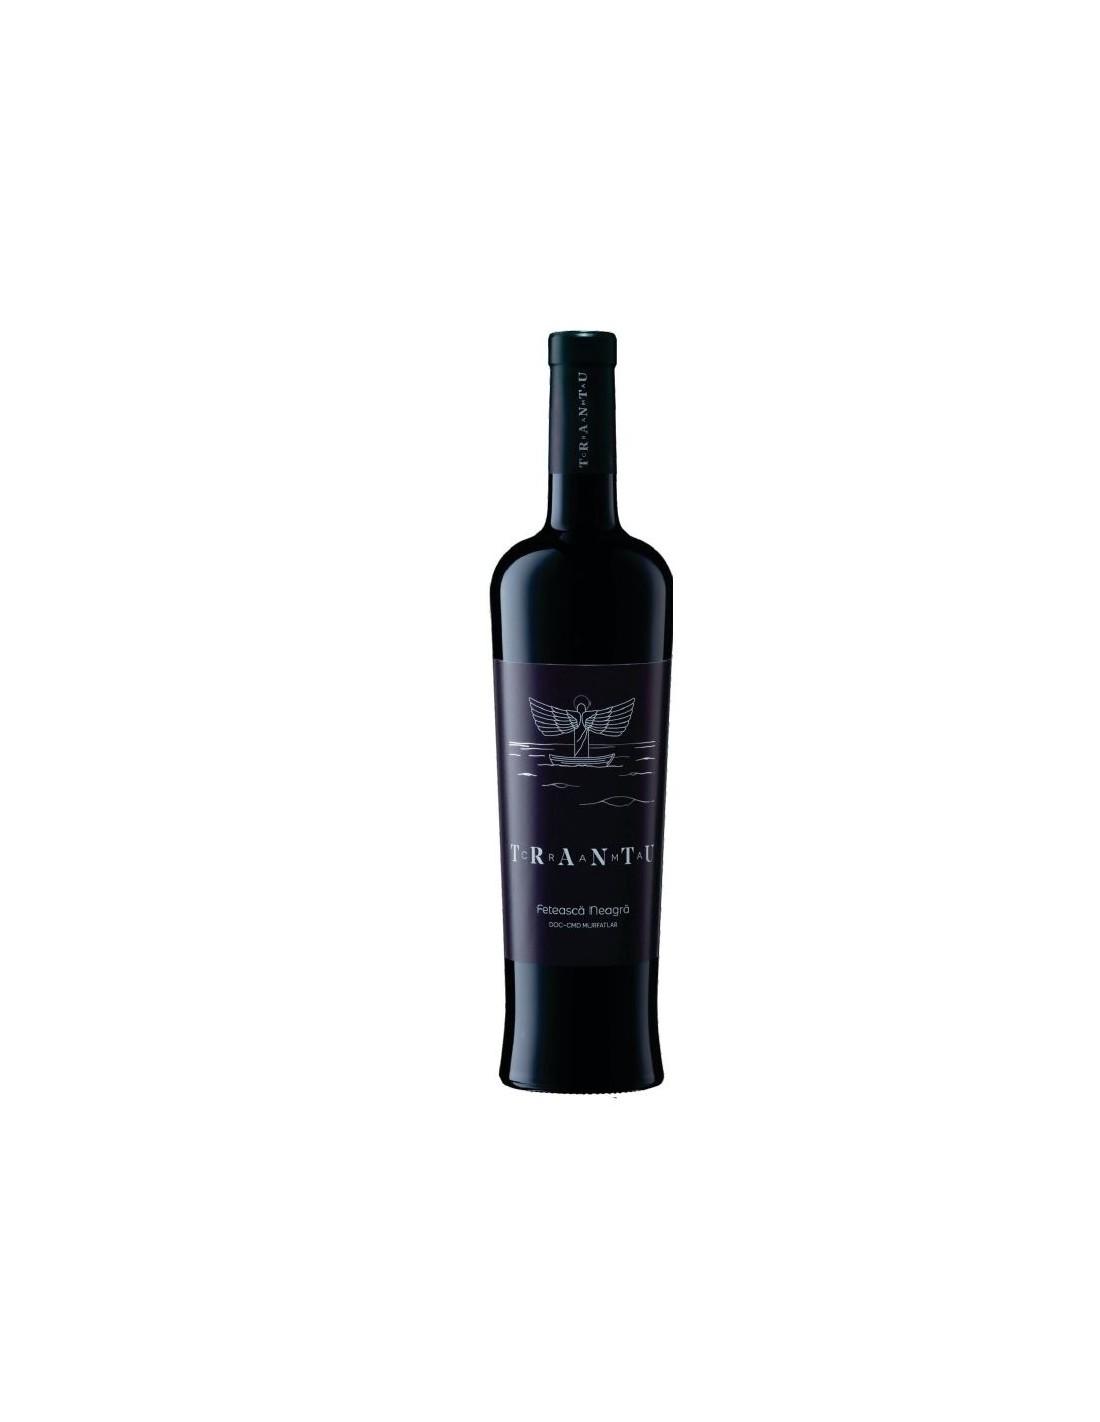 Vin rosu, Feteasca Neagra, Crama Trantu Murfatlar, 0.75L, 14% alc., Romania